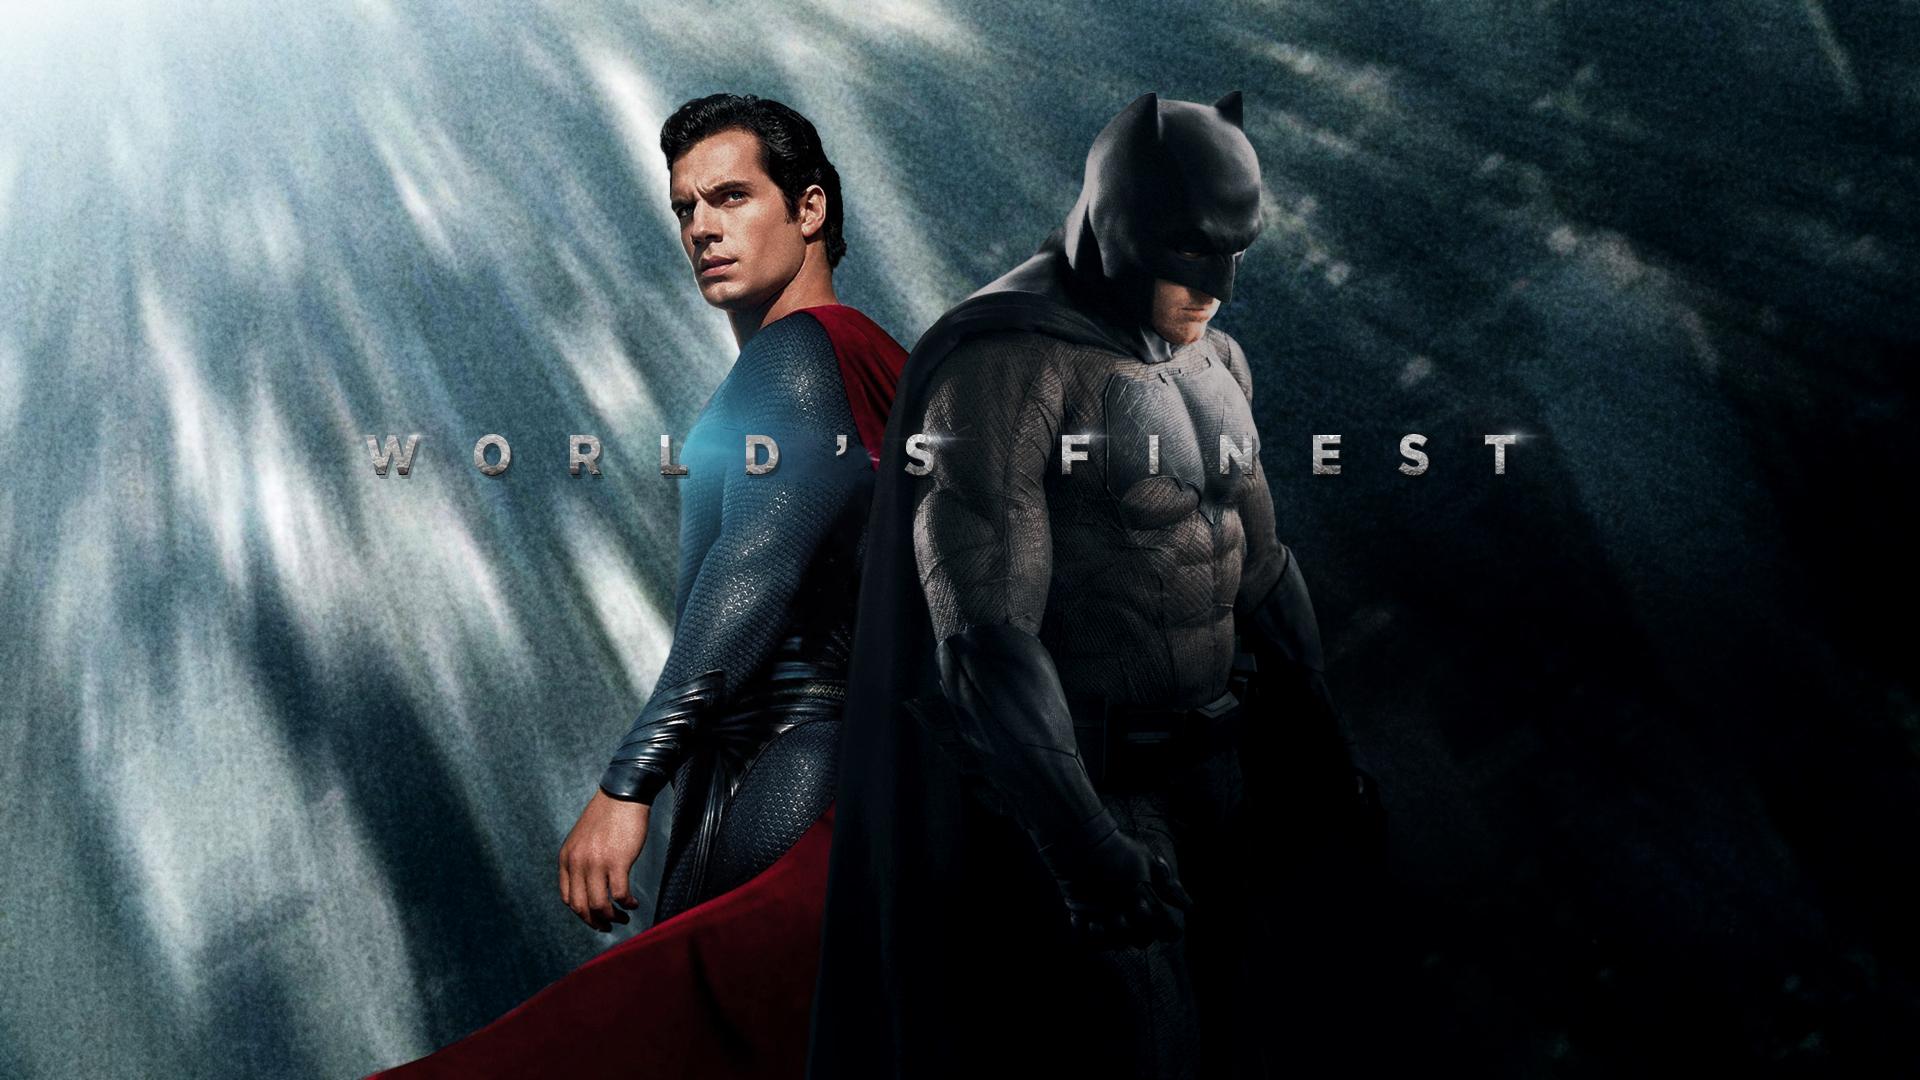 wallpaper superman batman finest world art imwithstoopid13 1920x1080